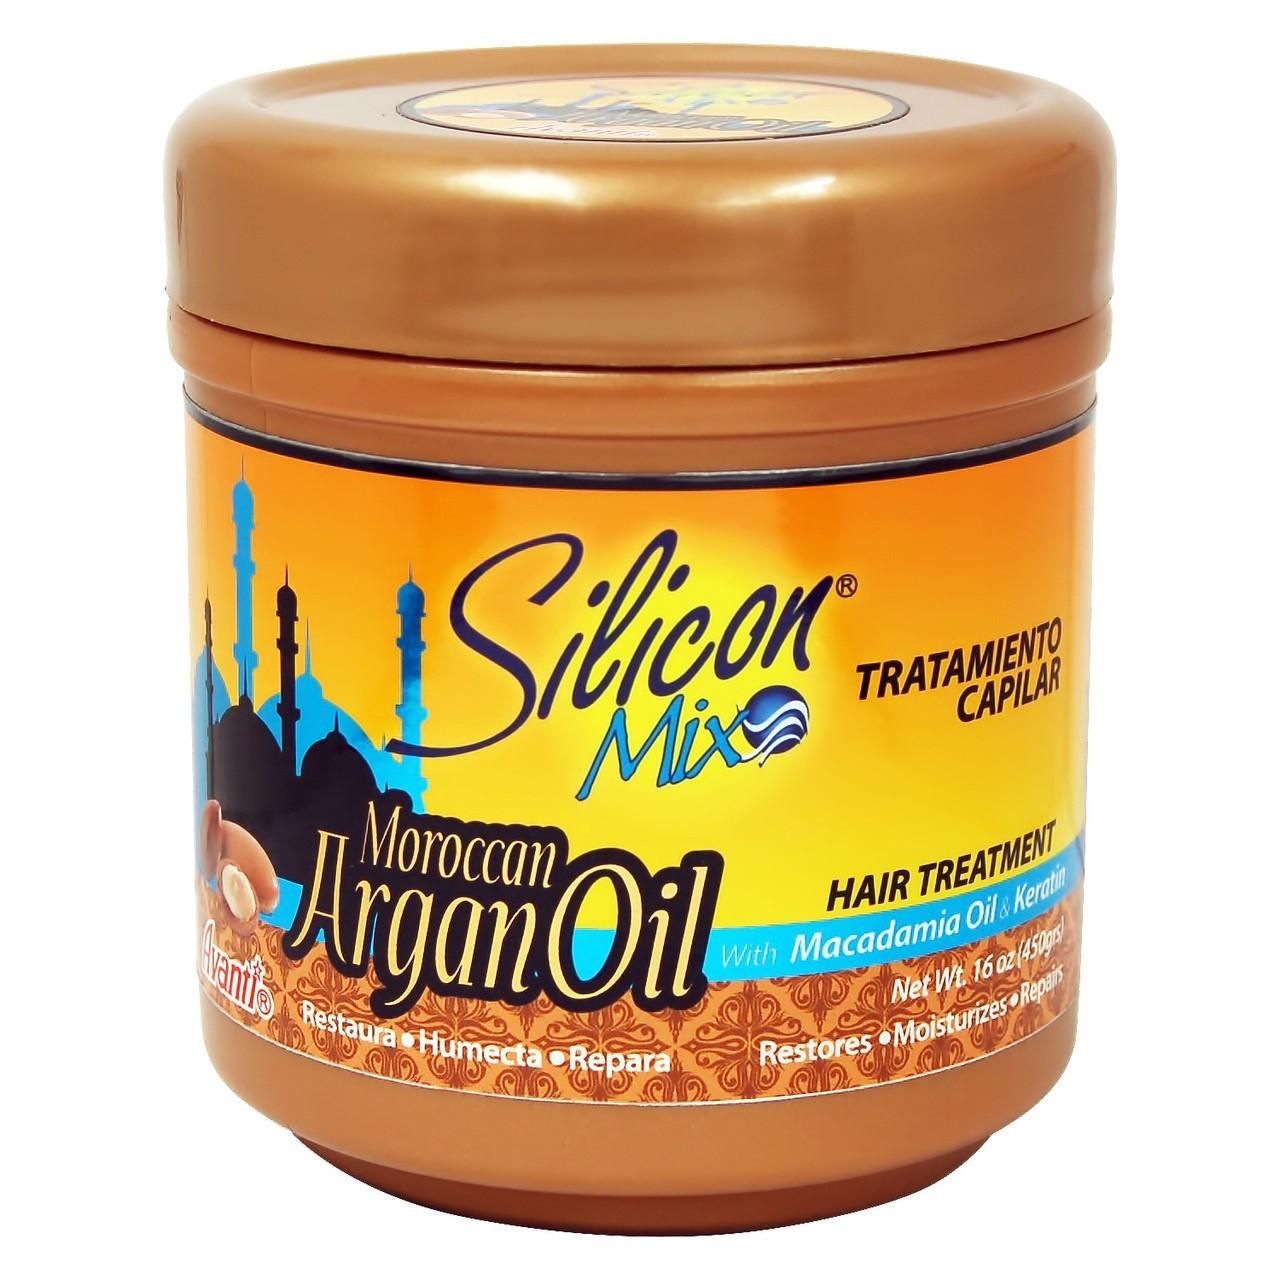 SILICON MIX Maroccan Argan Oil Hair Treatment 16oz